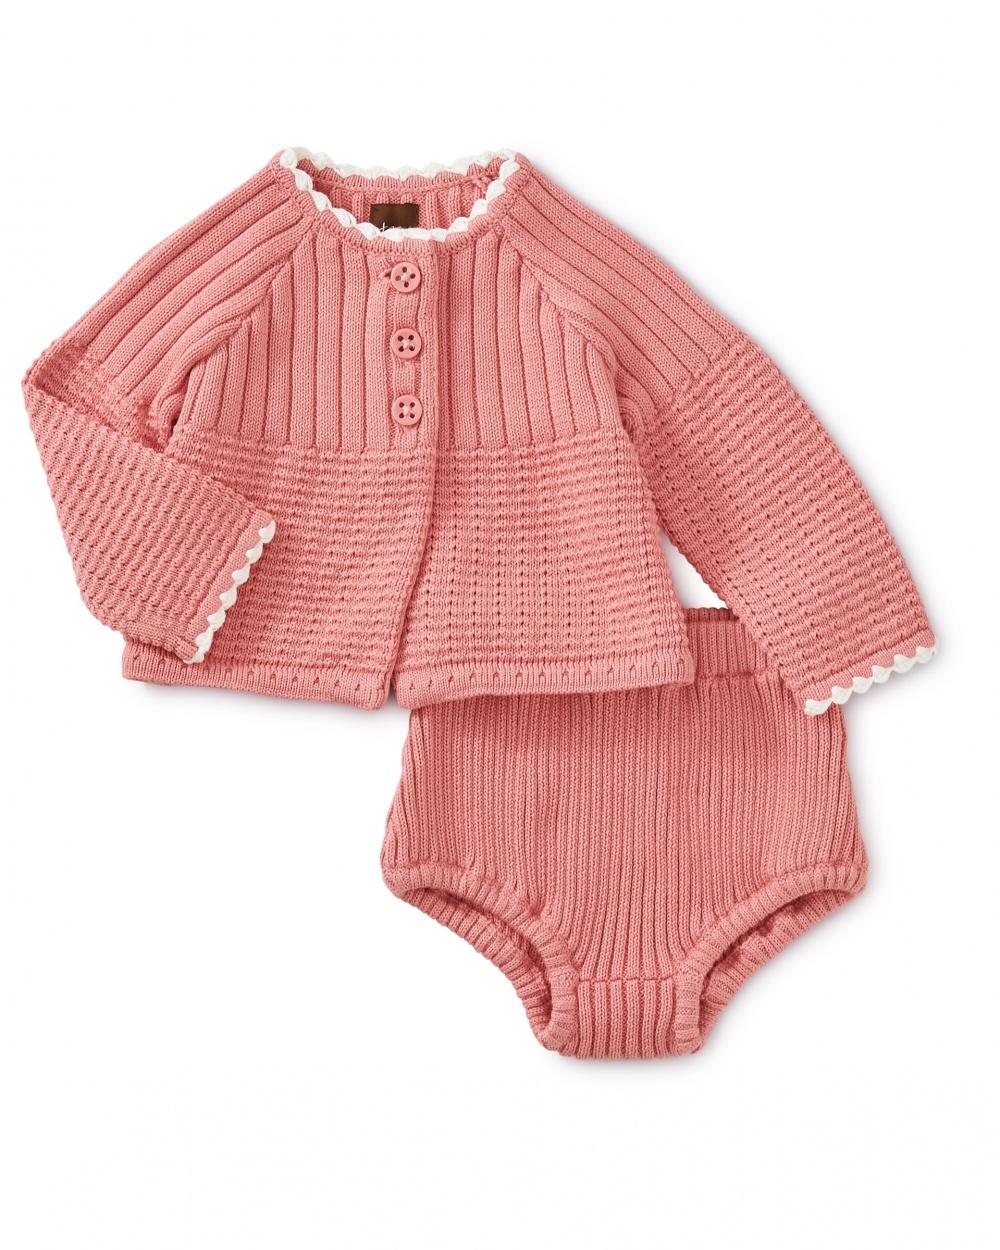 Sussex Girl Sweater Set